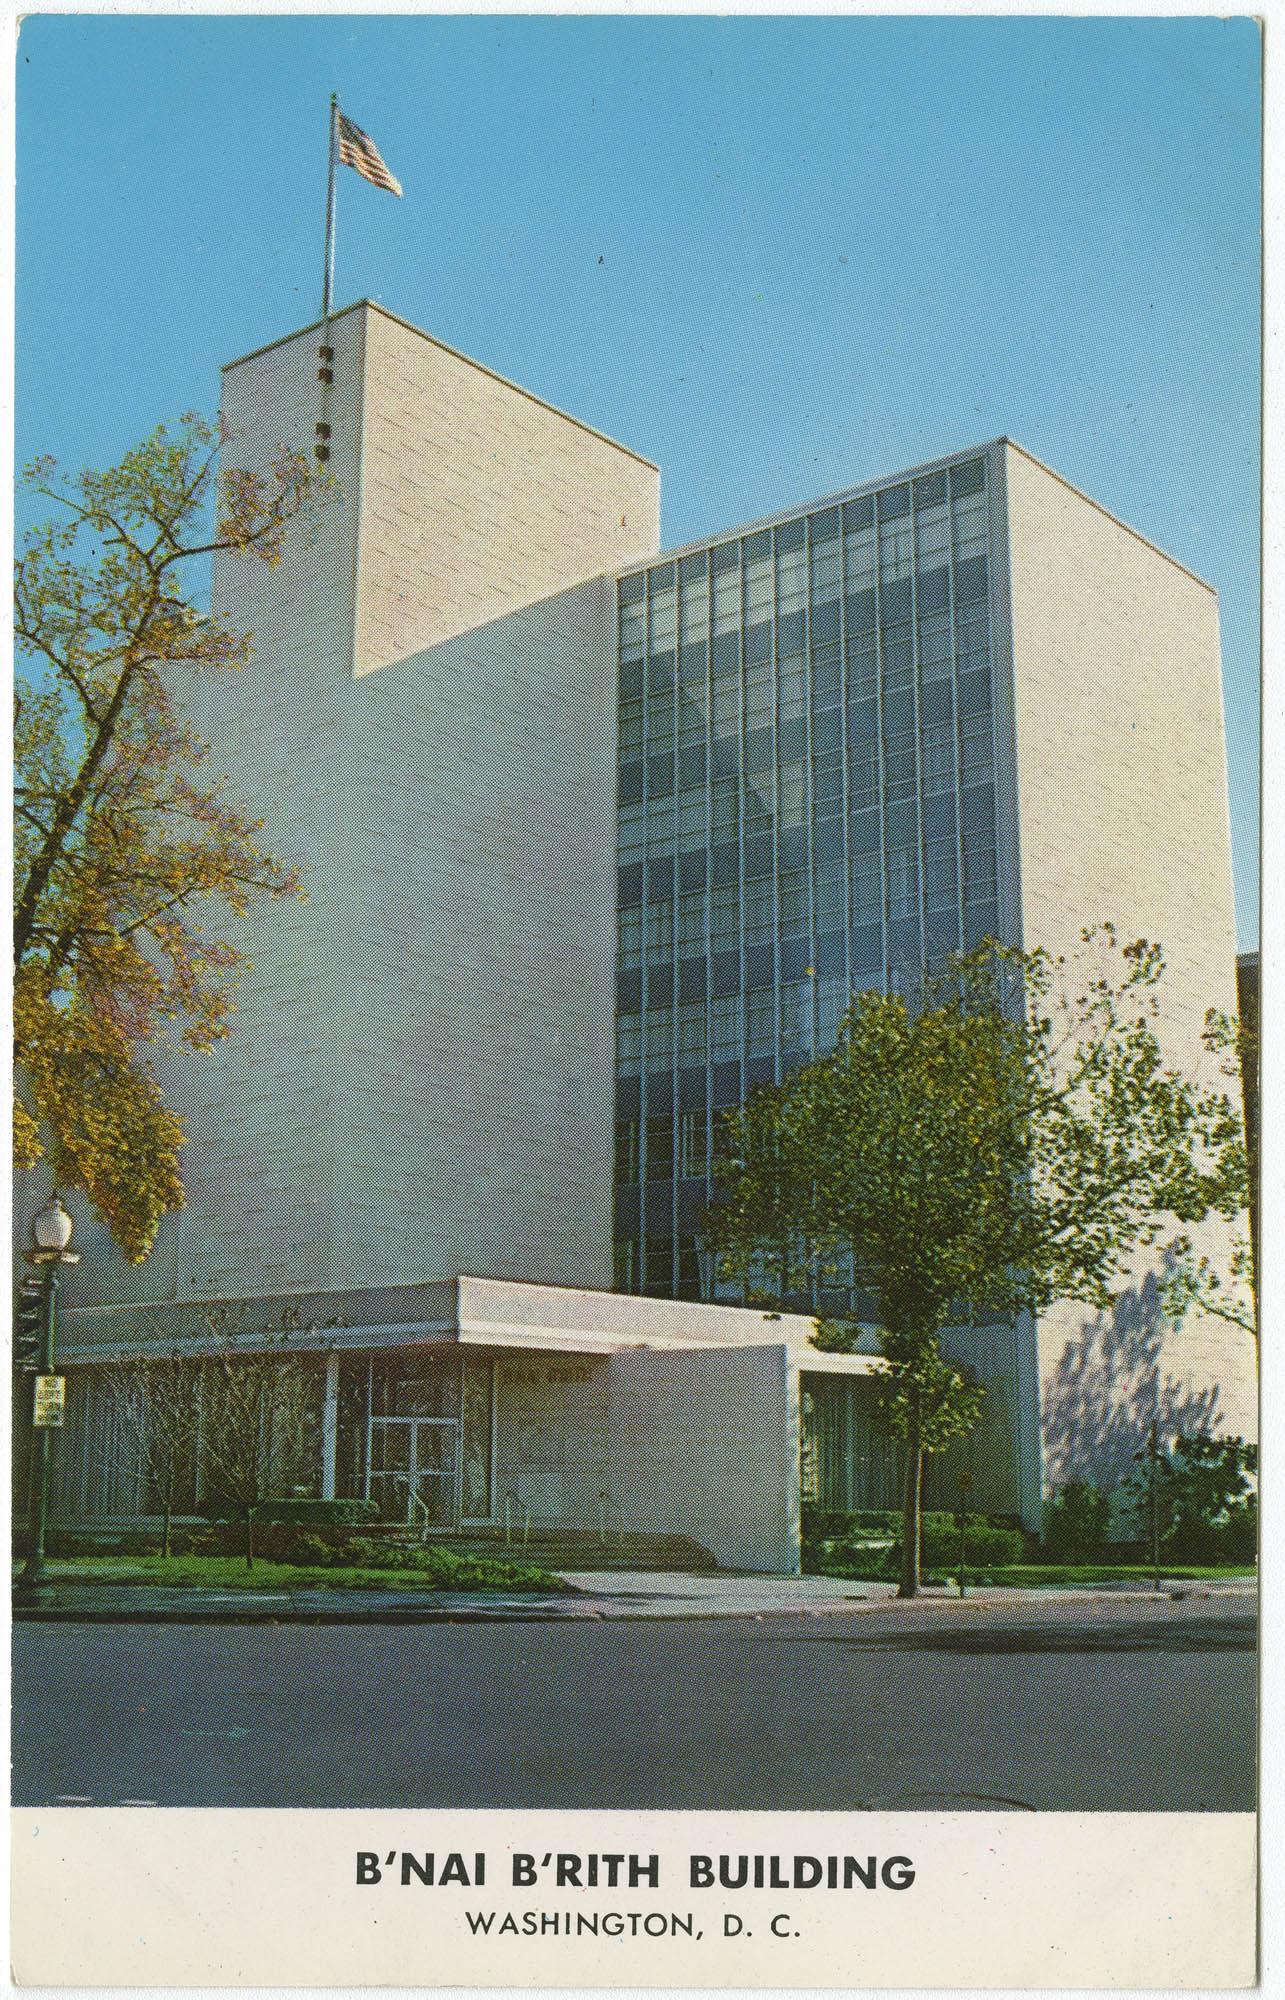 B'nai B'rith Building, Washington, D.C.